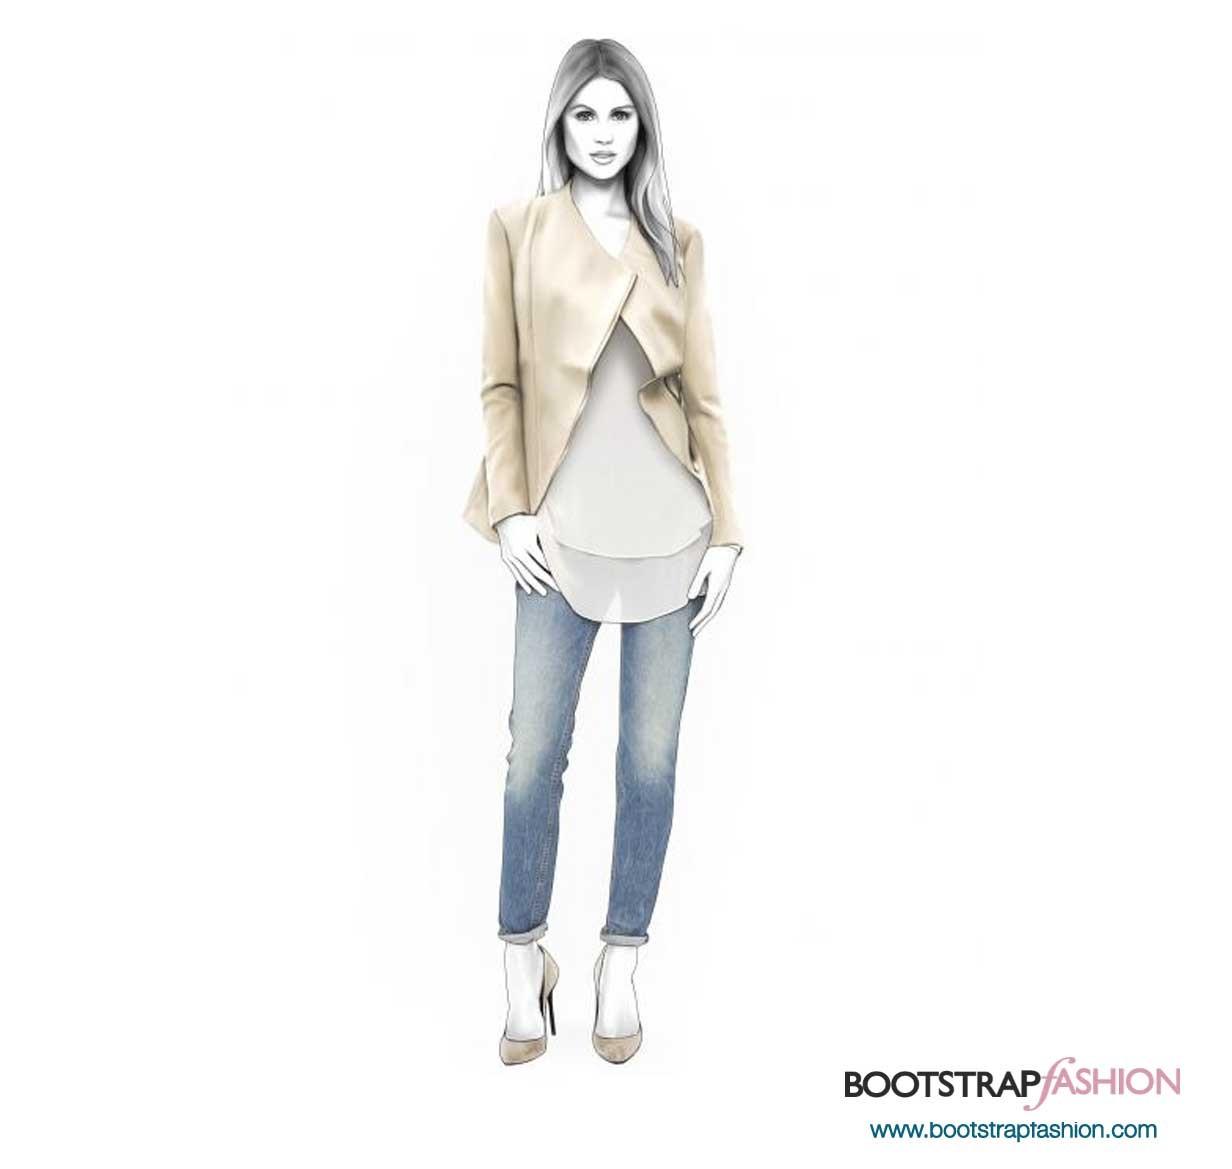 Bootstrapfashion.com - Designer Sewing Patterns, Free Trend Reports ...